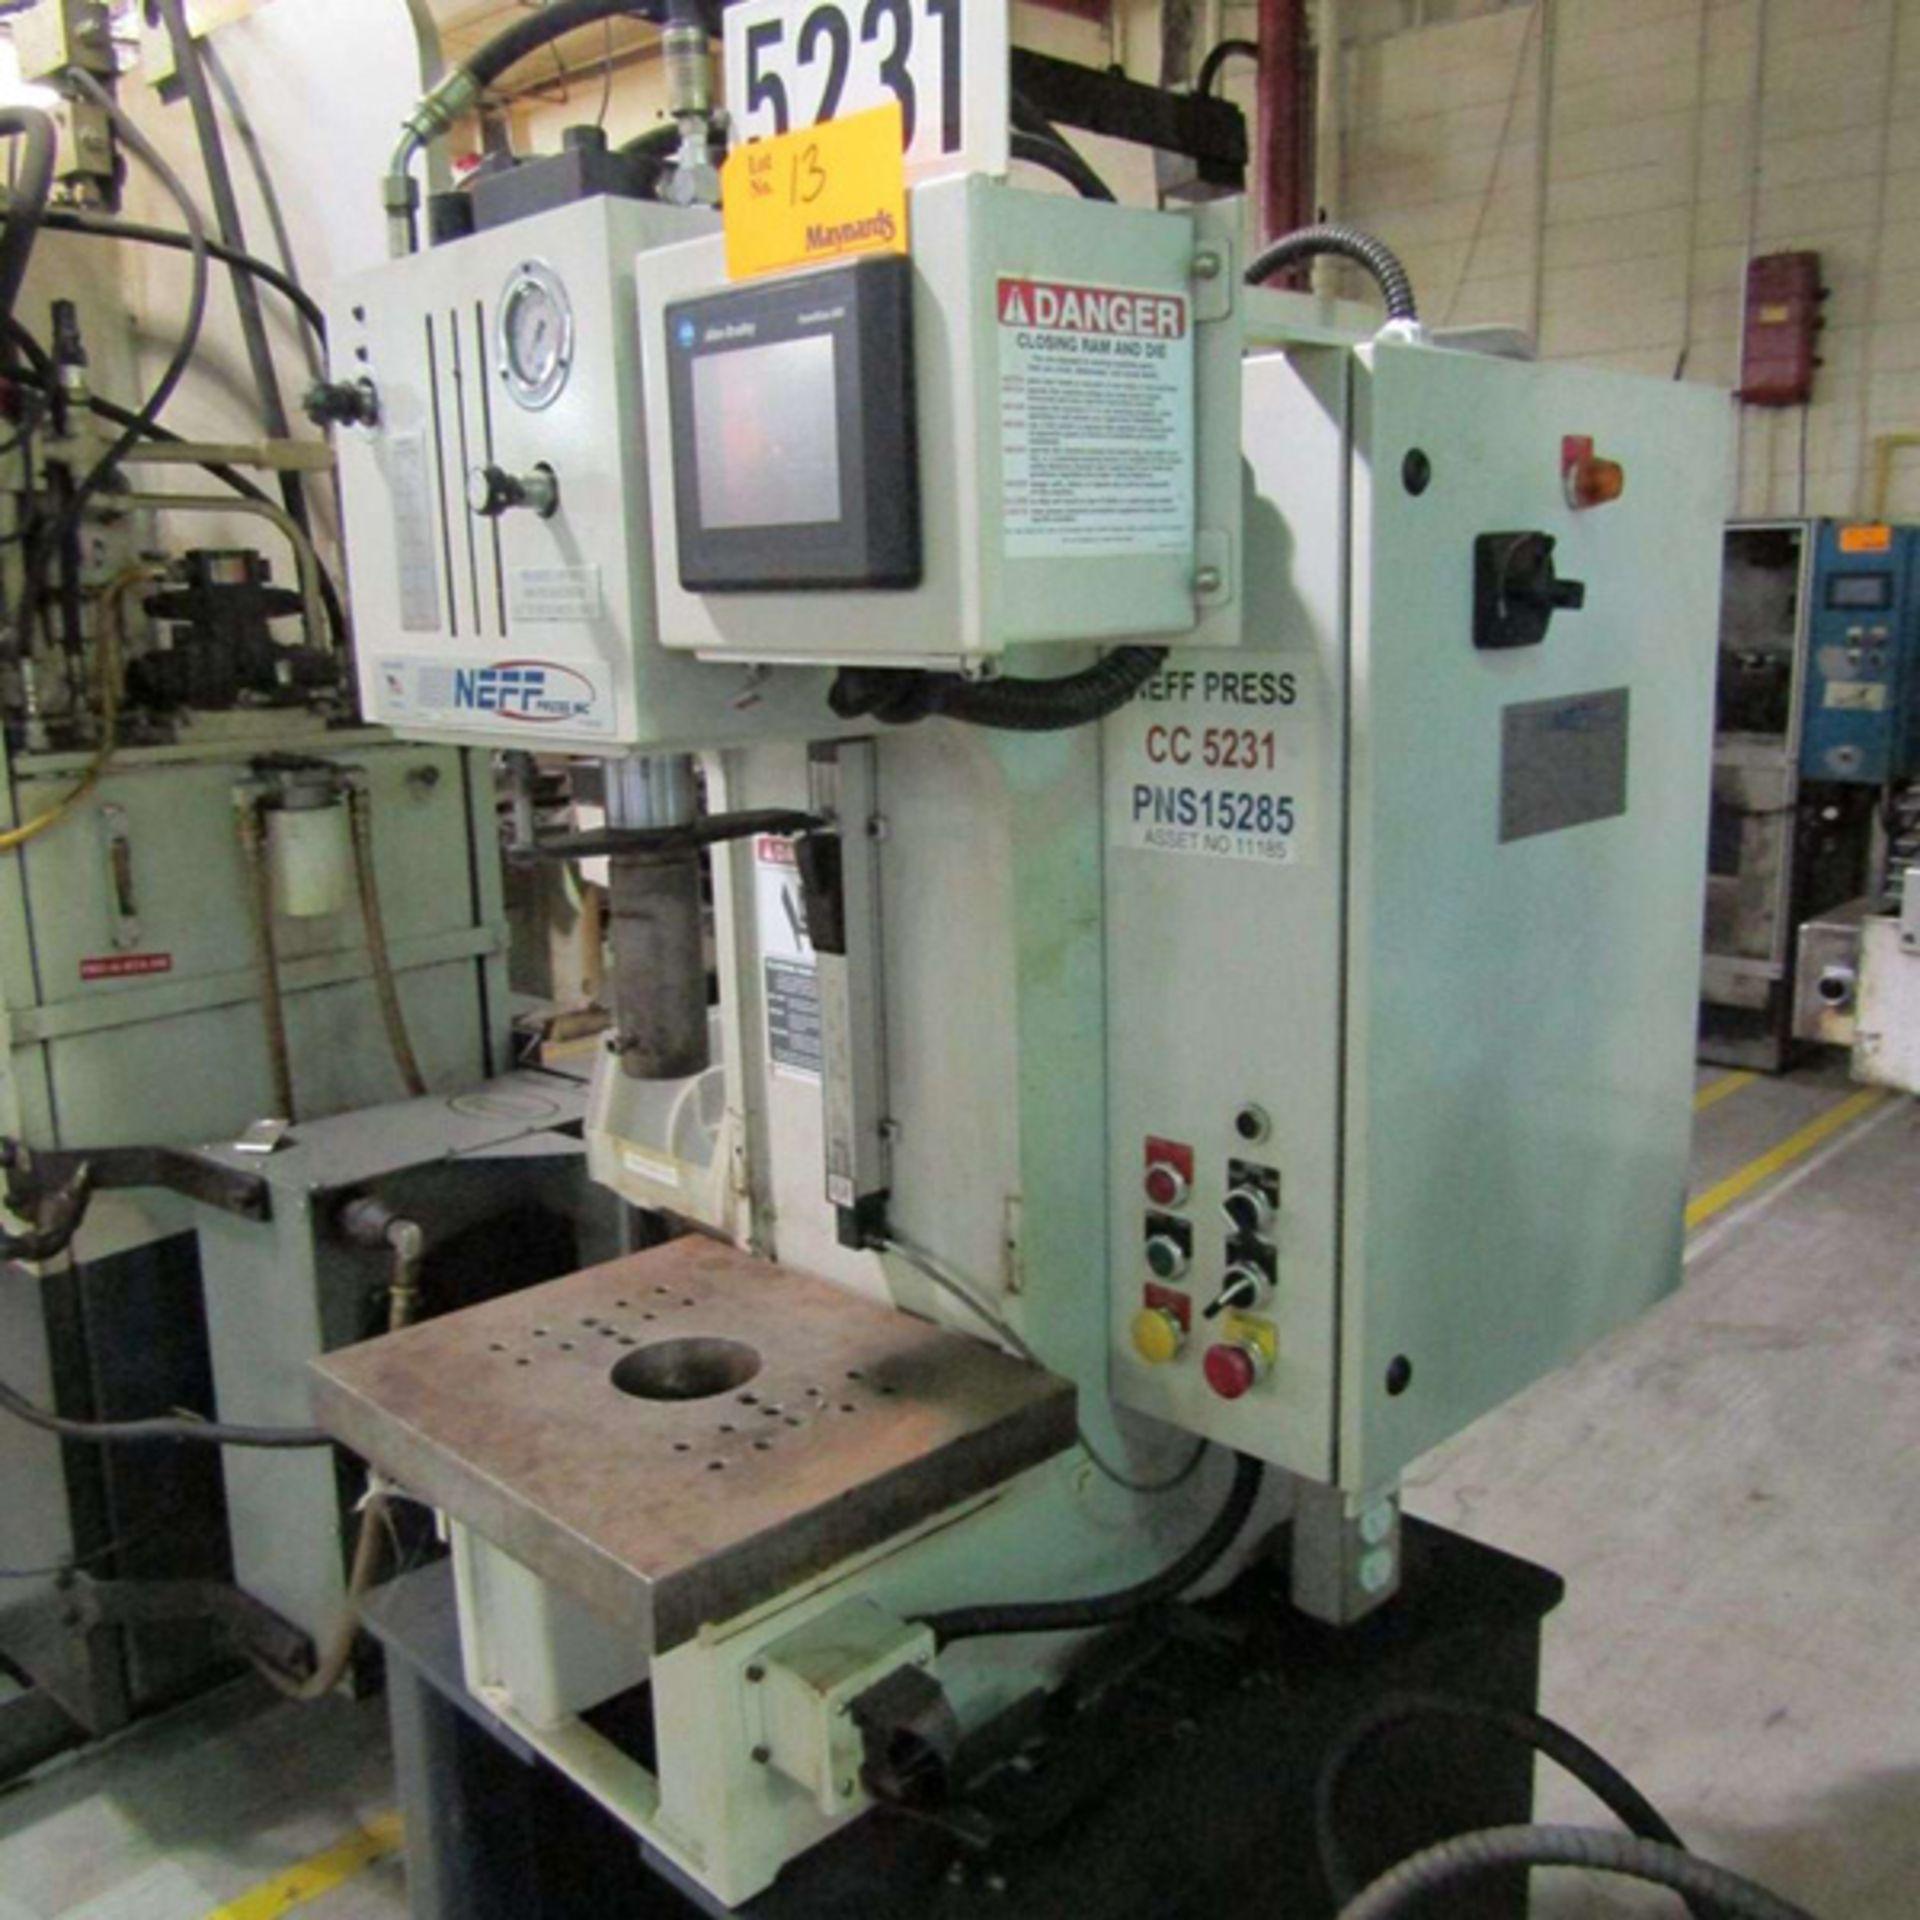 2008 Neff D7-5M C Hydraulic C Frame Press | 7-Ton, Mdl: D7-5M, S/N: 12335 - 8141P - Image 2 of 4